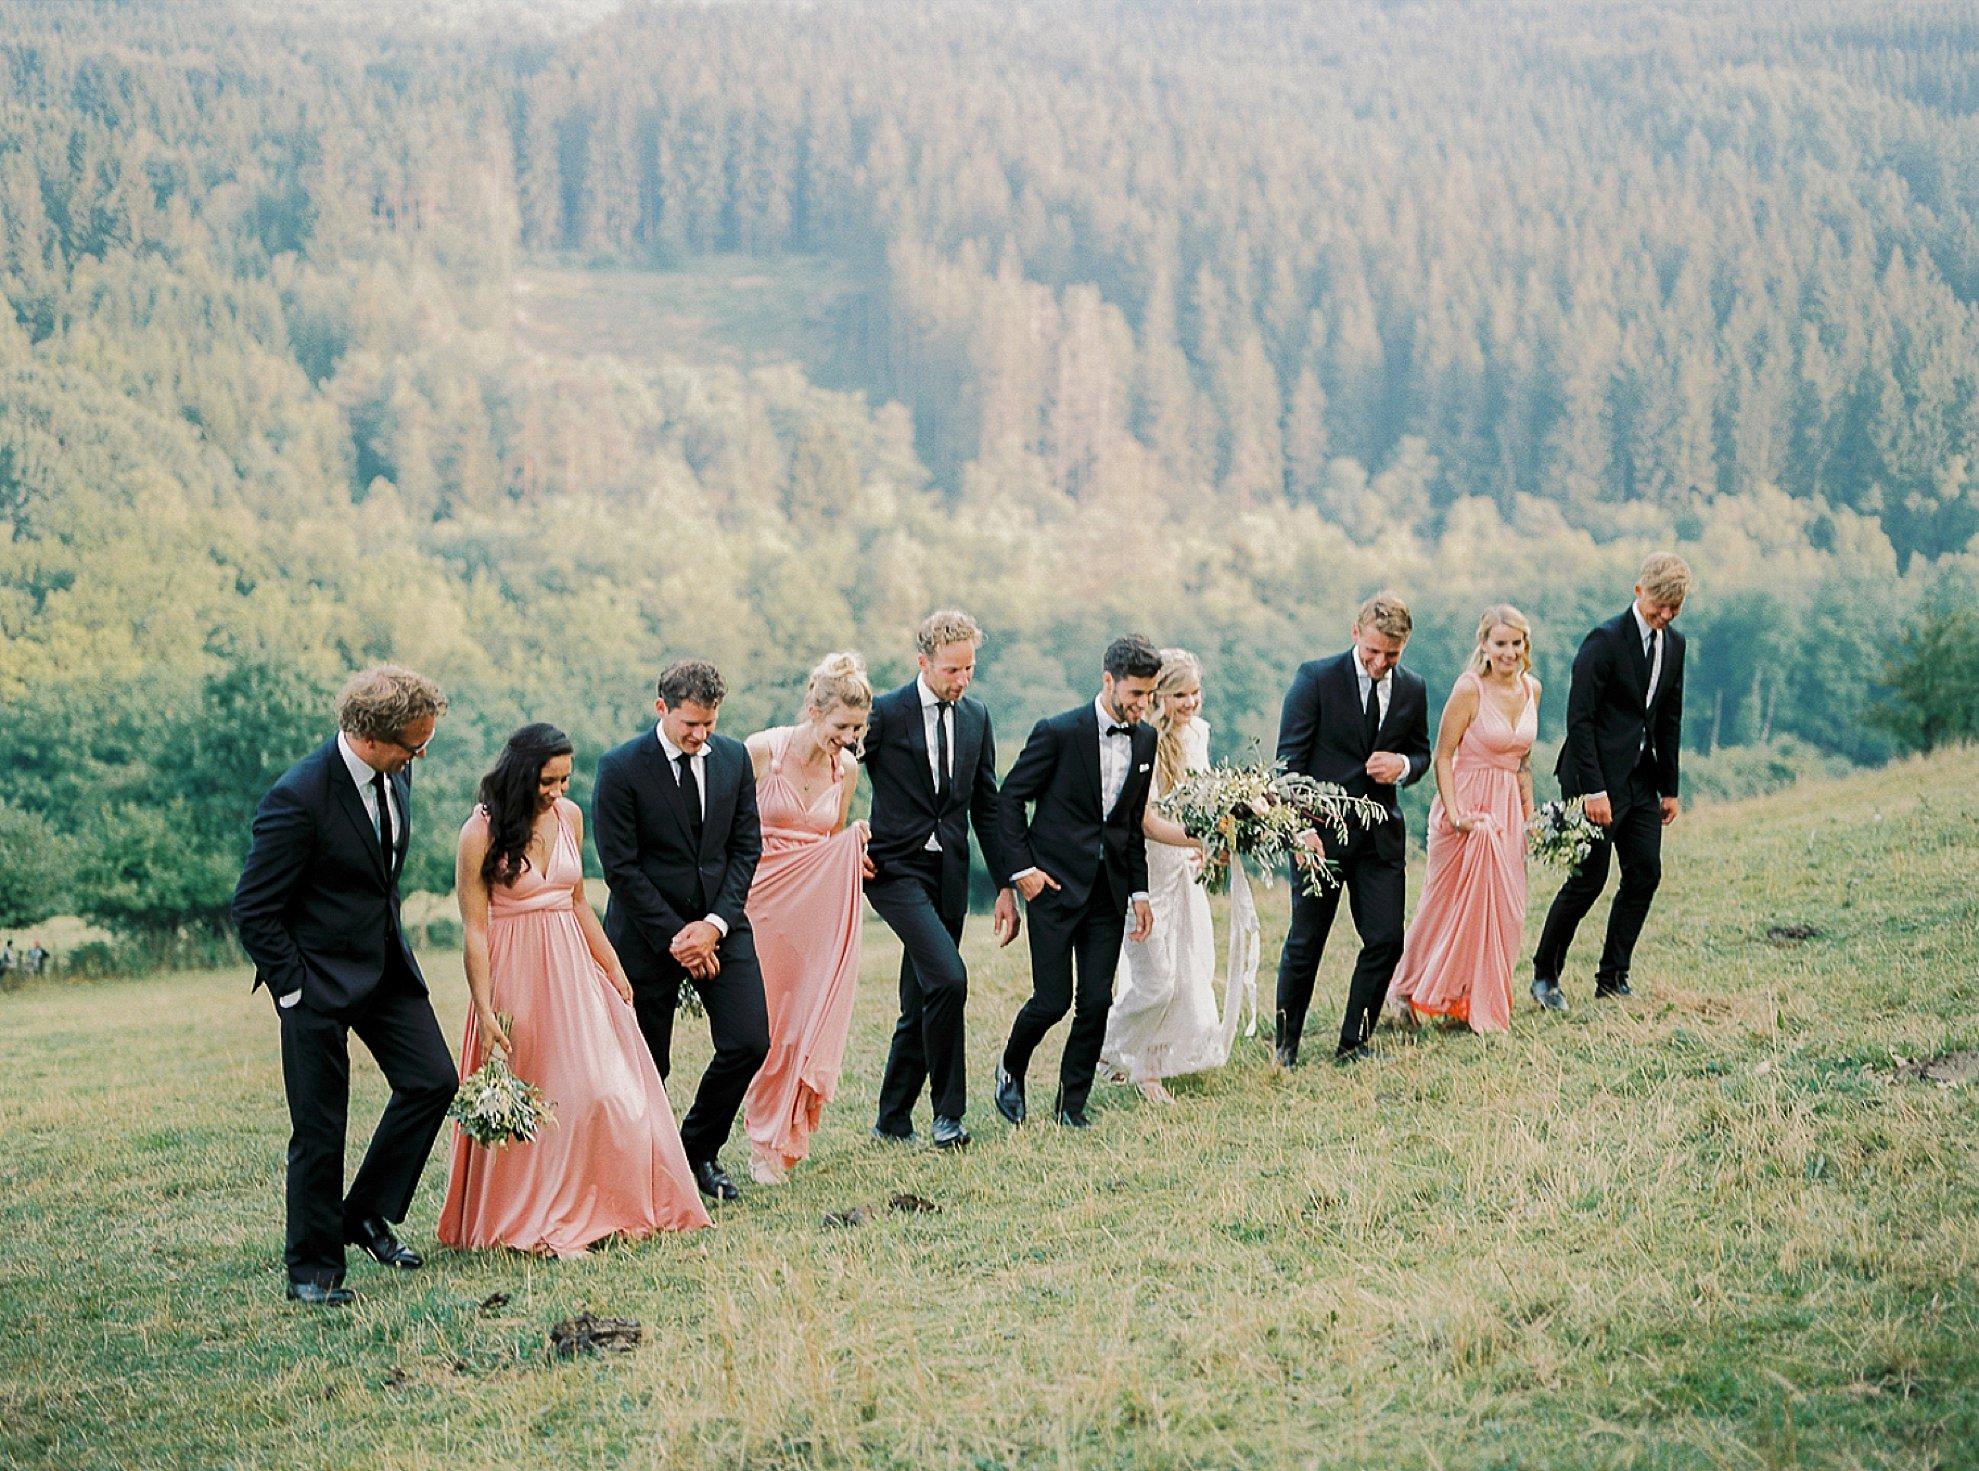 Amanda-Drost-Fotografie-Belgie-Photography-Wedding_0028.jpg